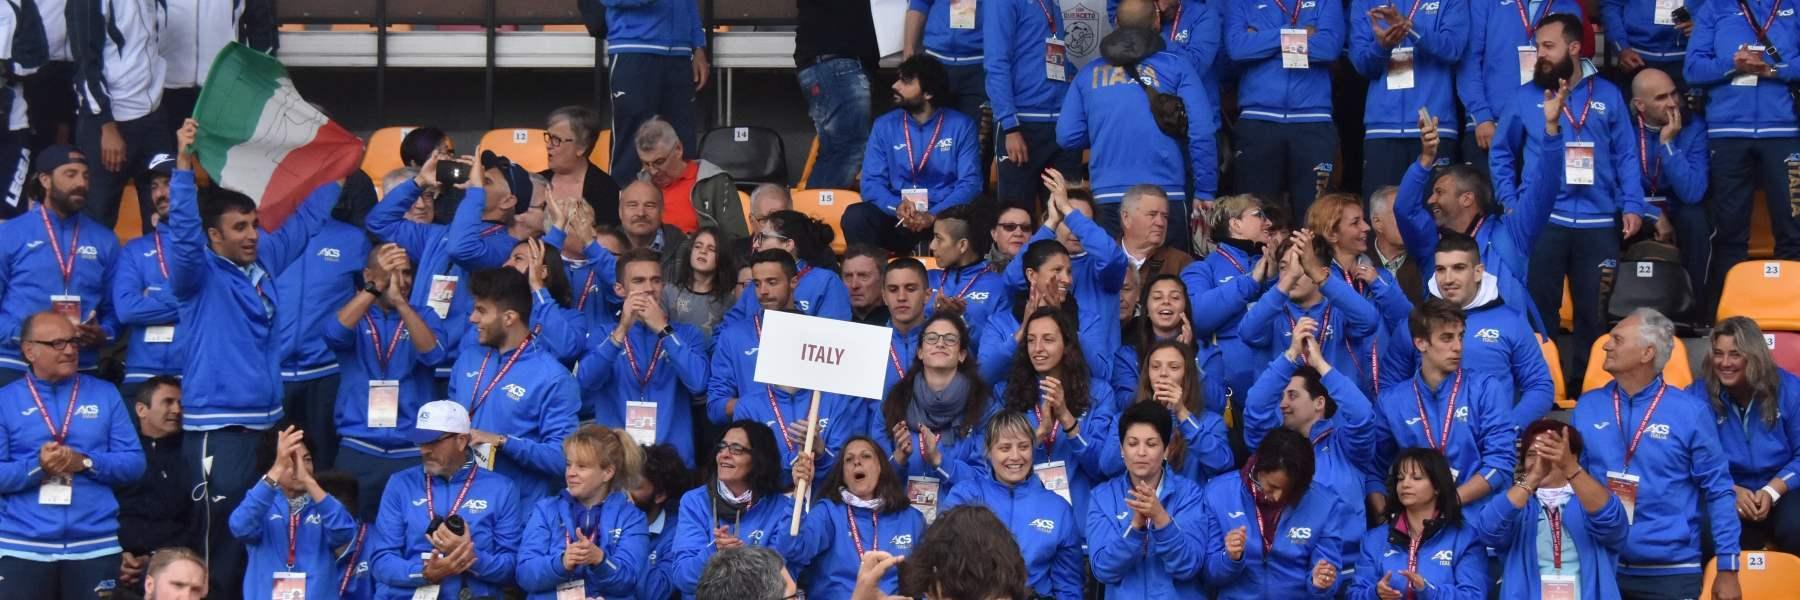 CSIT World Sports Games